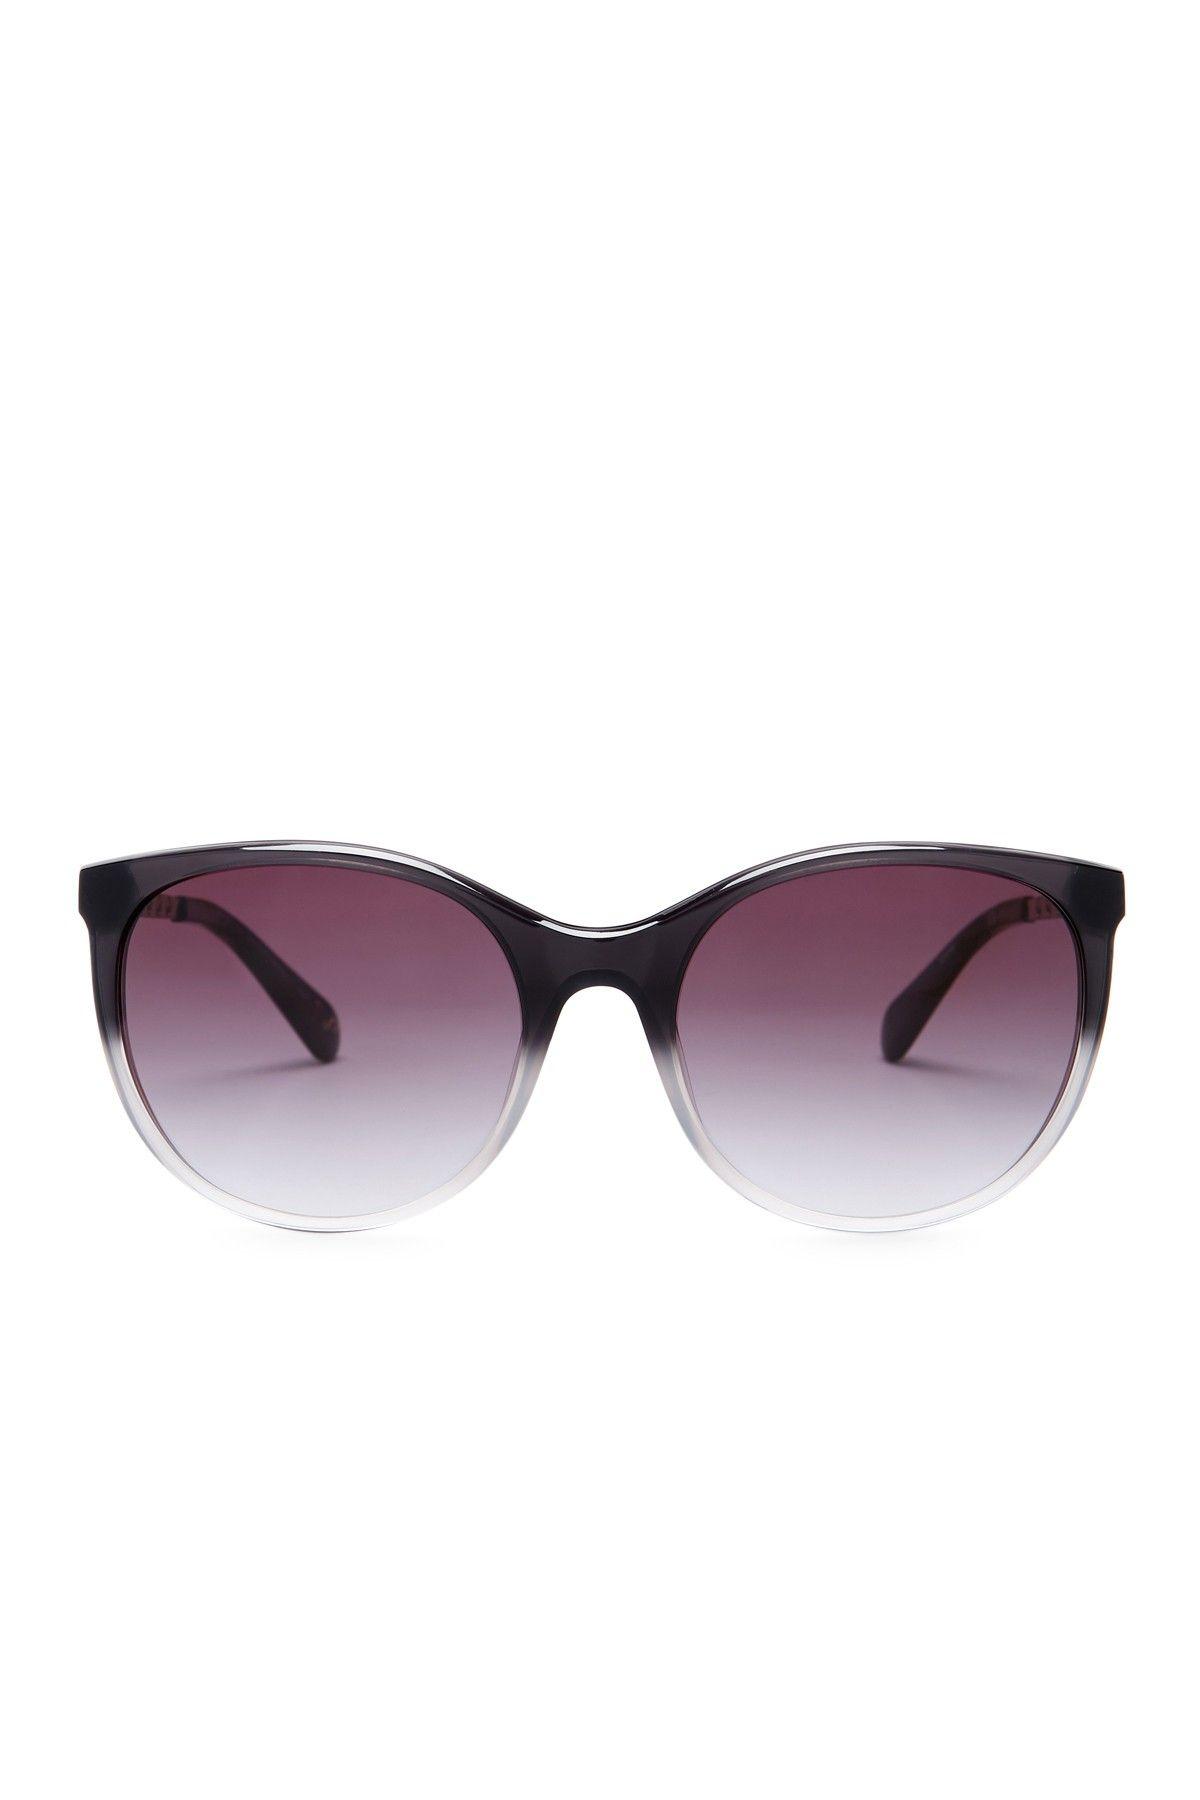 c99667a2b09 Diane Von Furstenberg · Sunglasses · Ships · Plastic · Nordstrom Rack · Free  Shipping · Women s Demi Cat Eye Plastic Frame Sunglasses